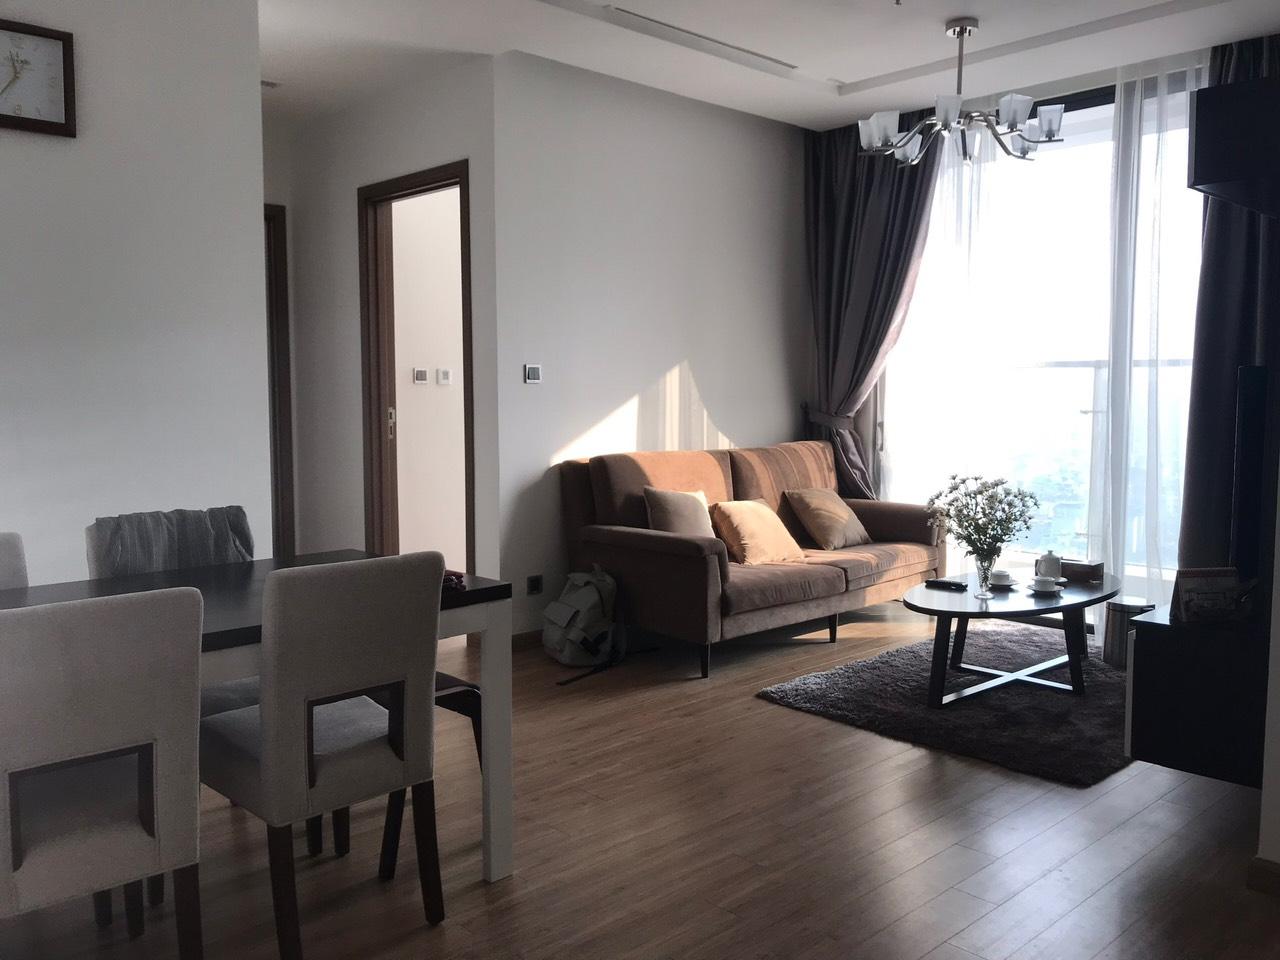 02 Bedroom Apartment for Rent Vinhomes Hanoi